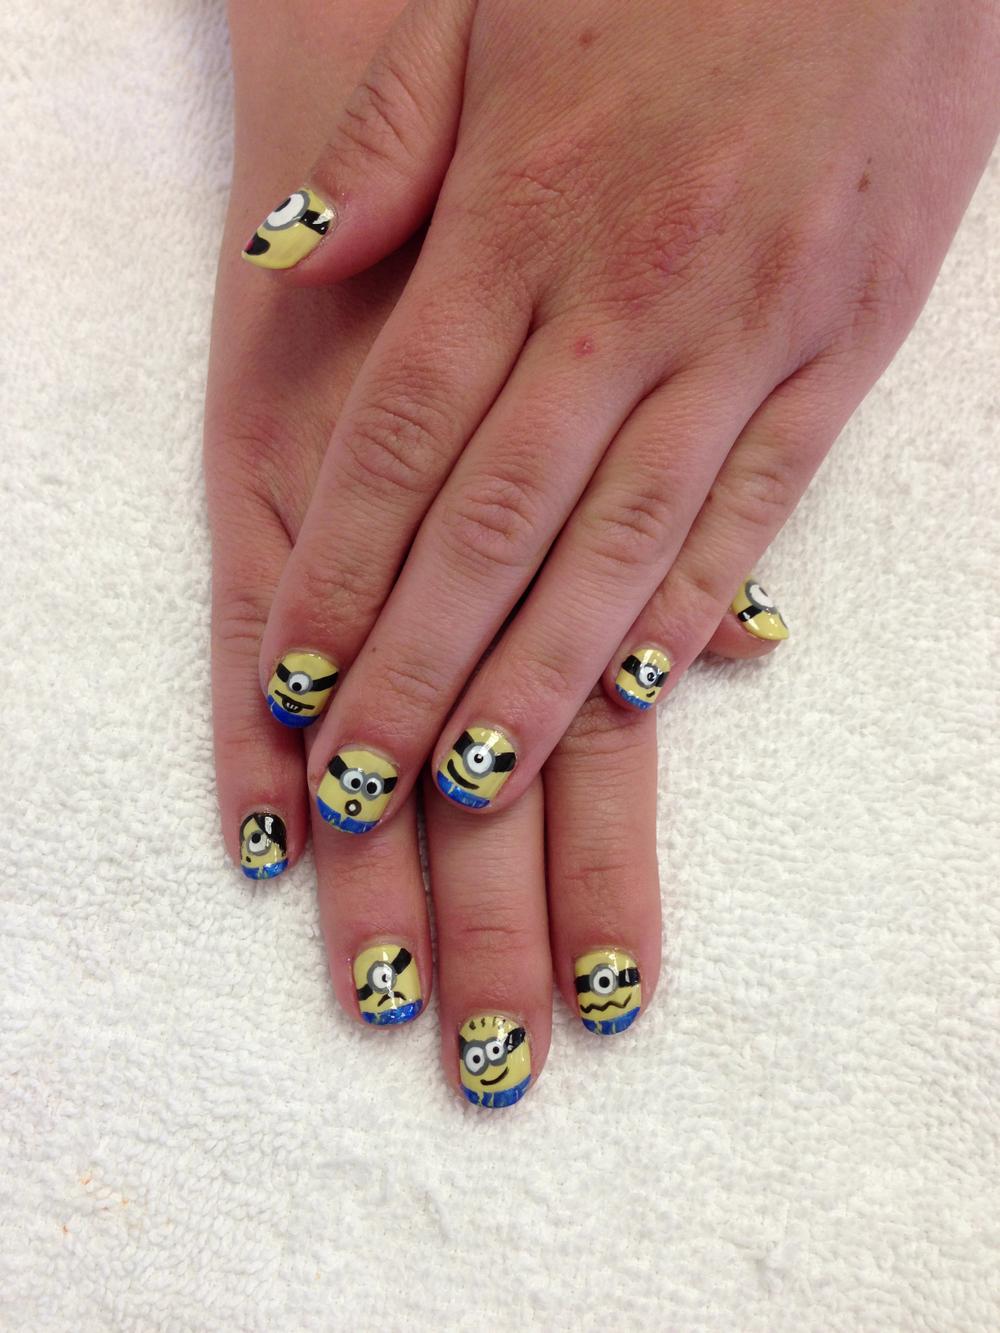 <p>Minion nails by Melisa Bruce, Sugar Ray's, Hermosa Beach, Calif.</p>